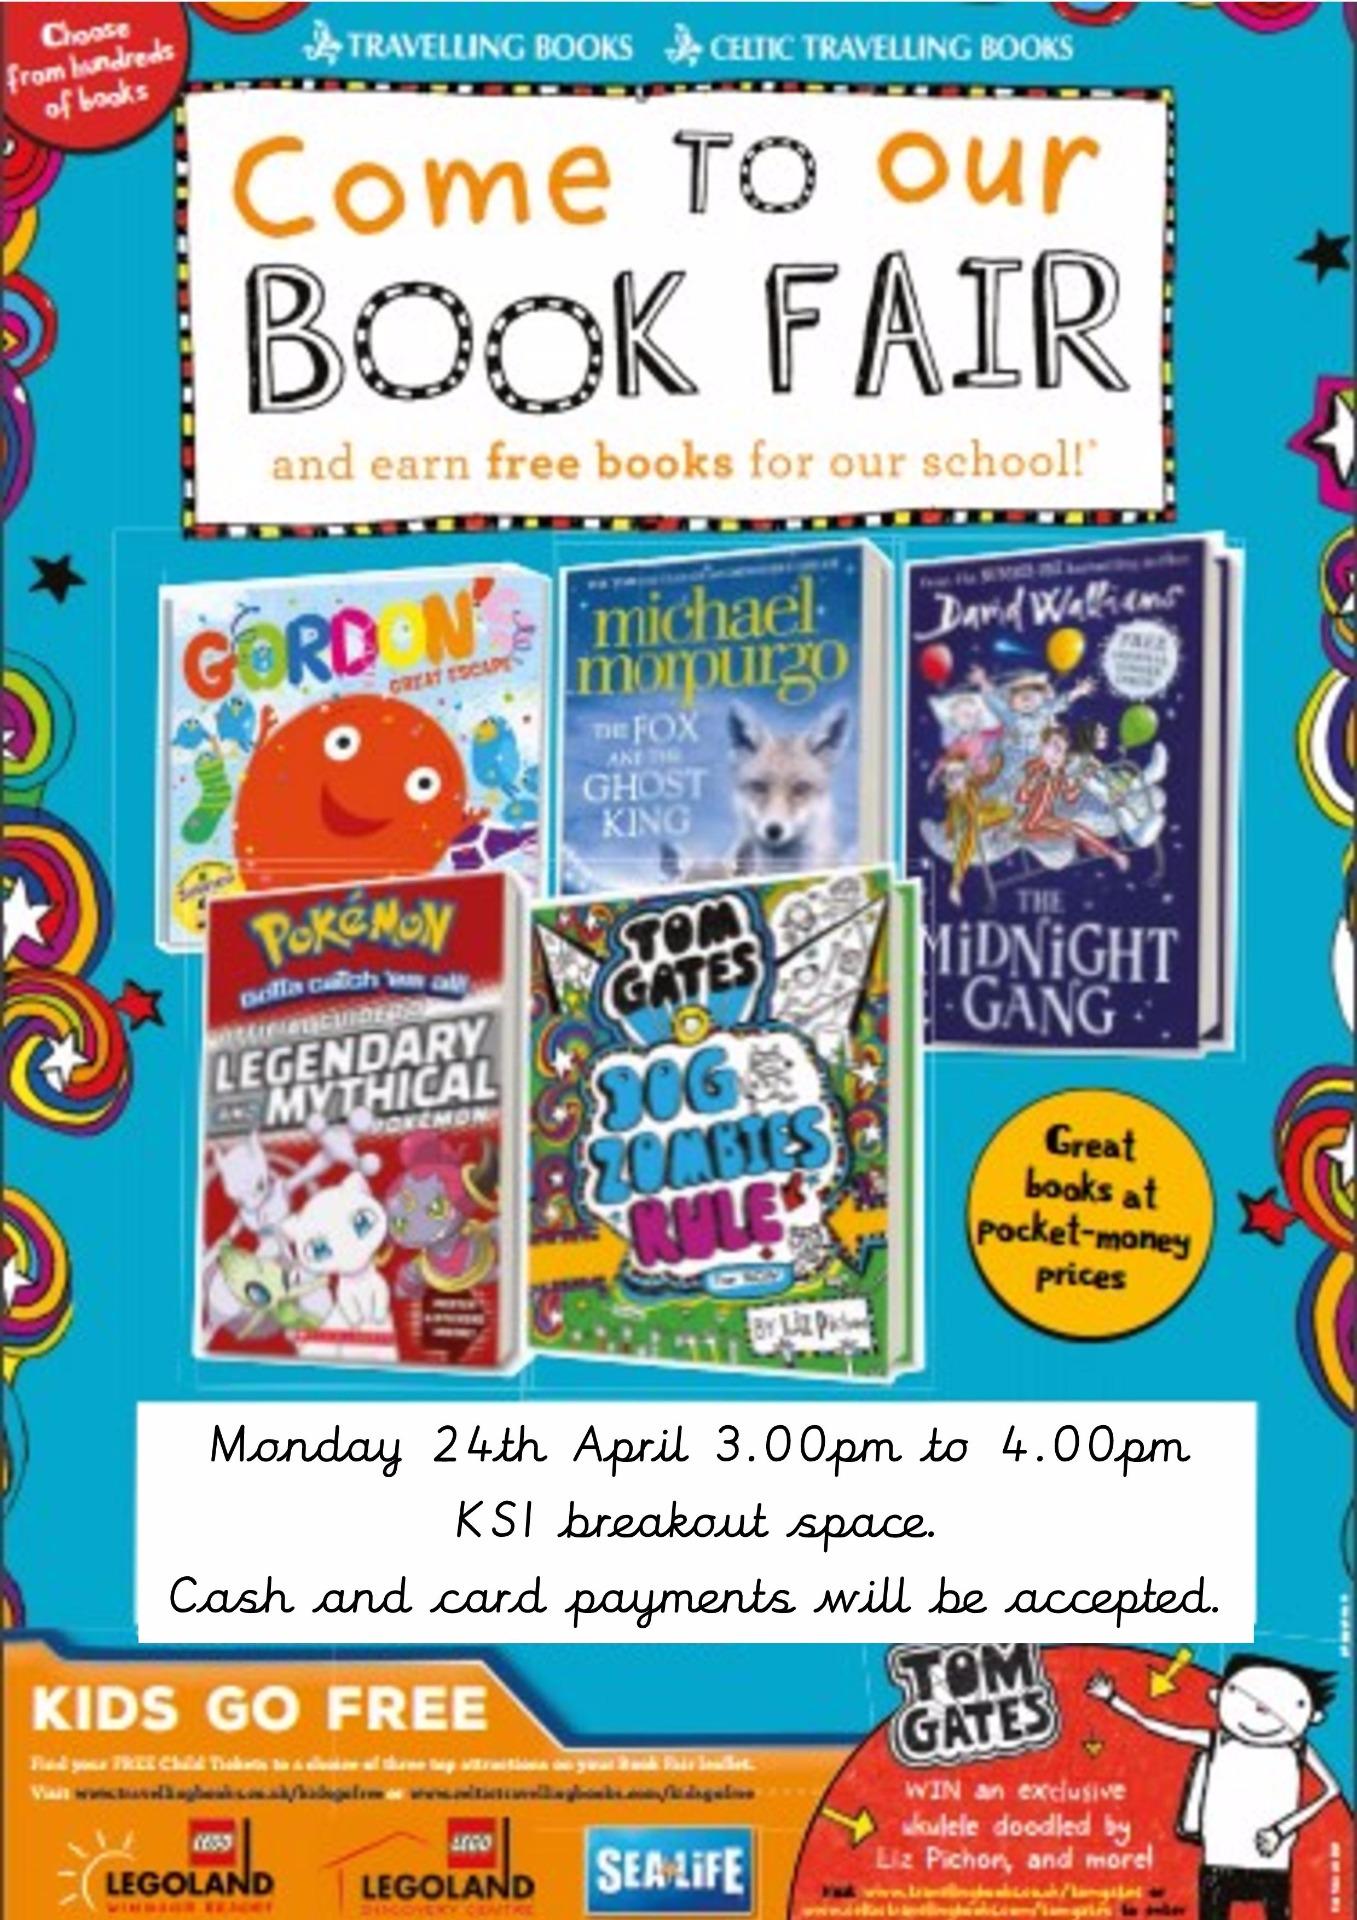 Bookbarn International – The Cat Edition – The Offbeat Route |Kitten Book Fair Posters